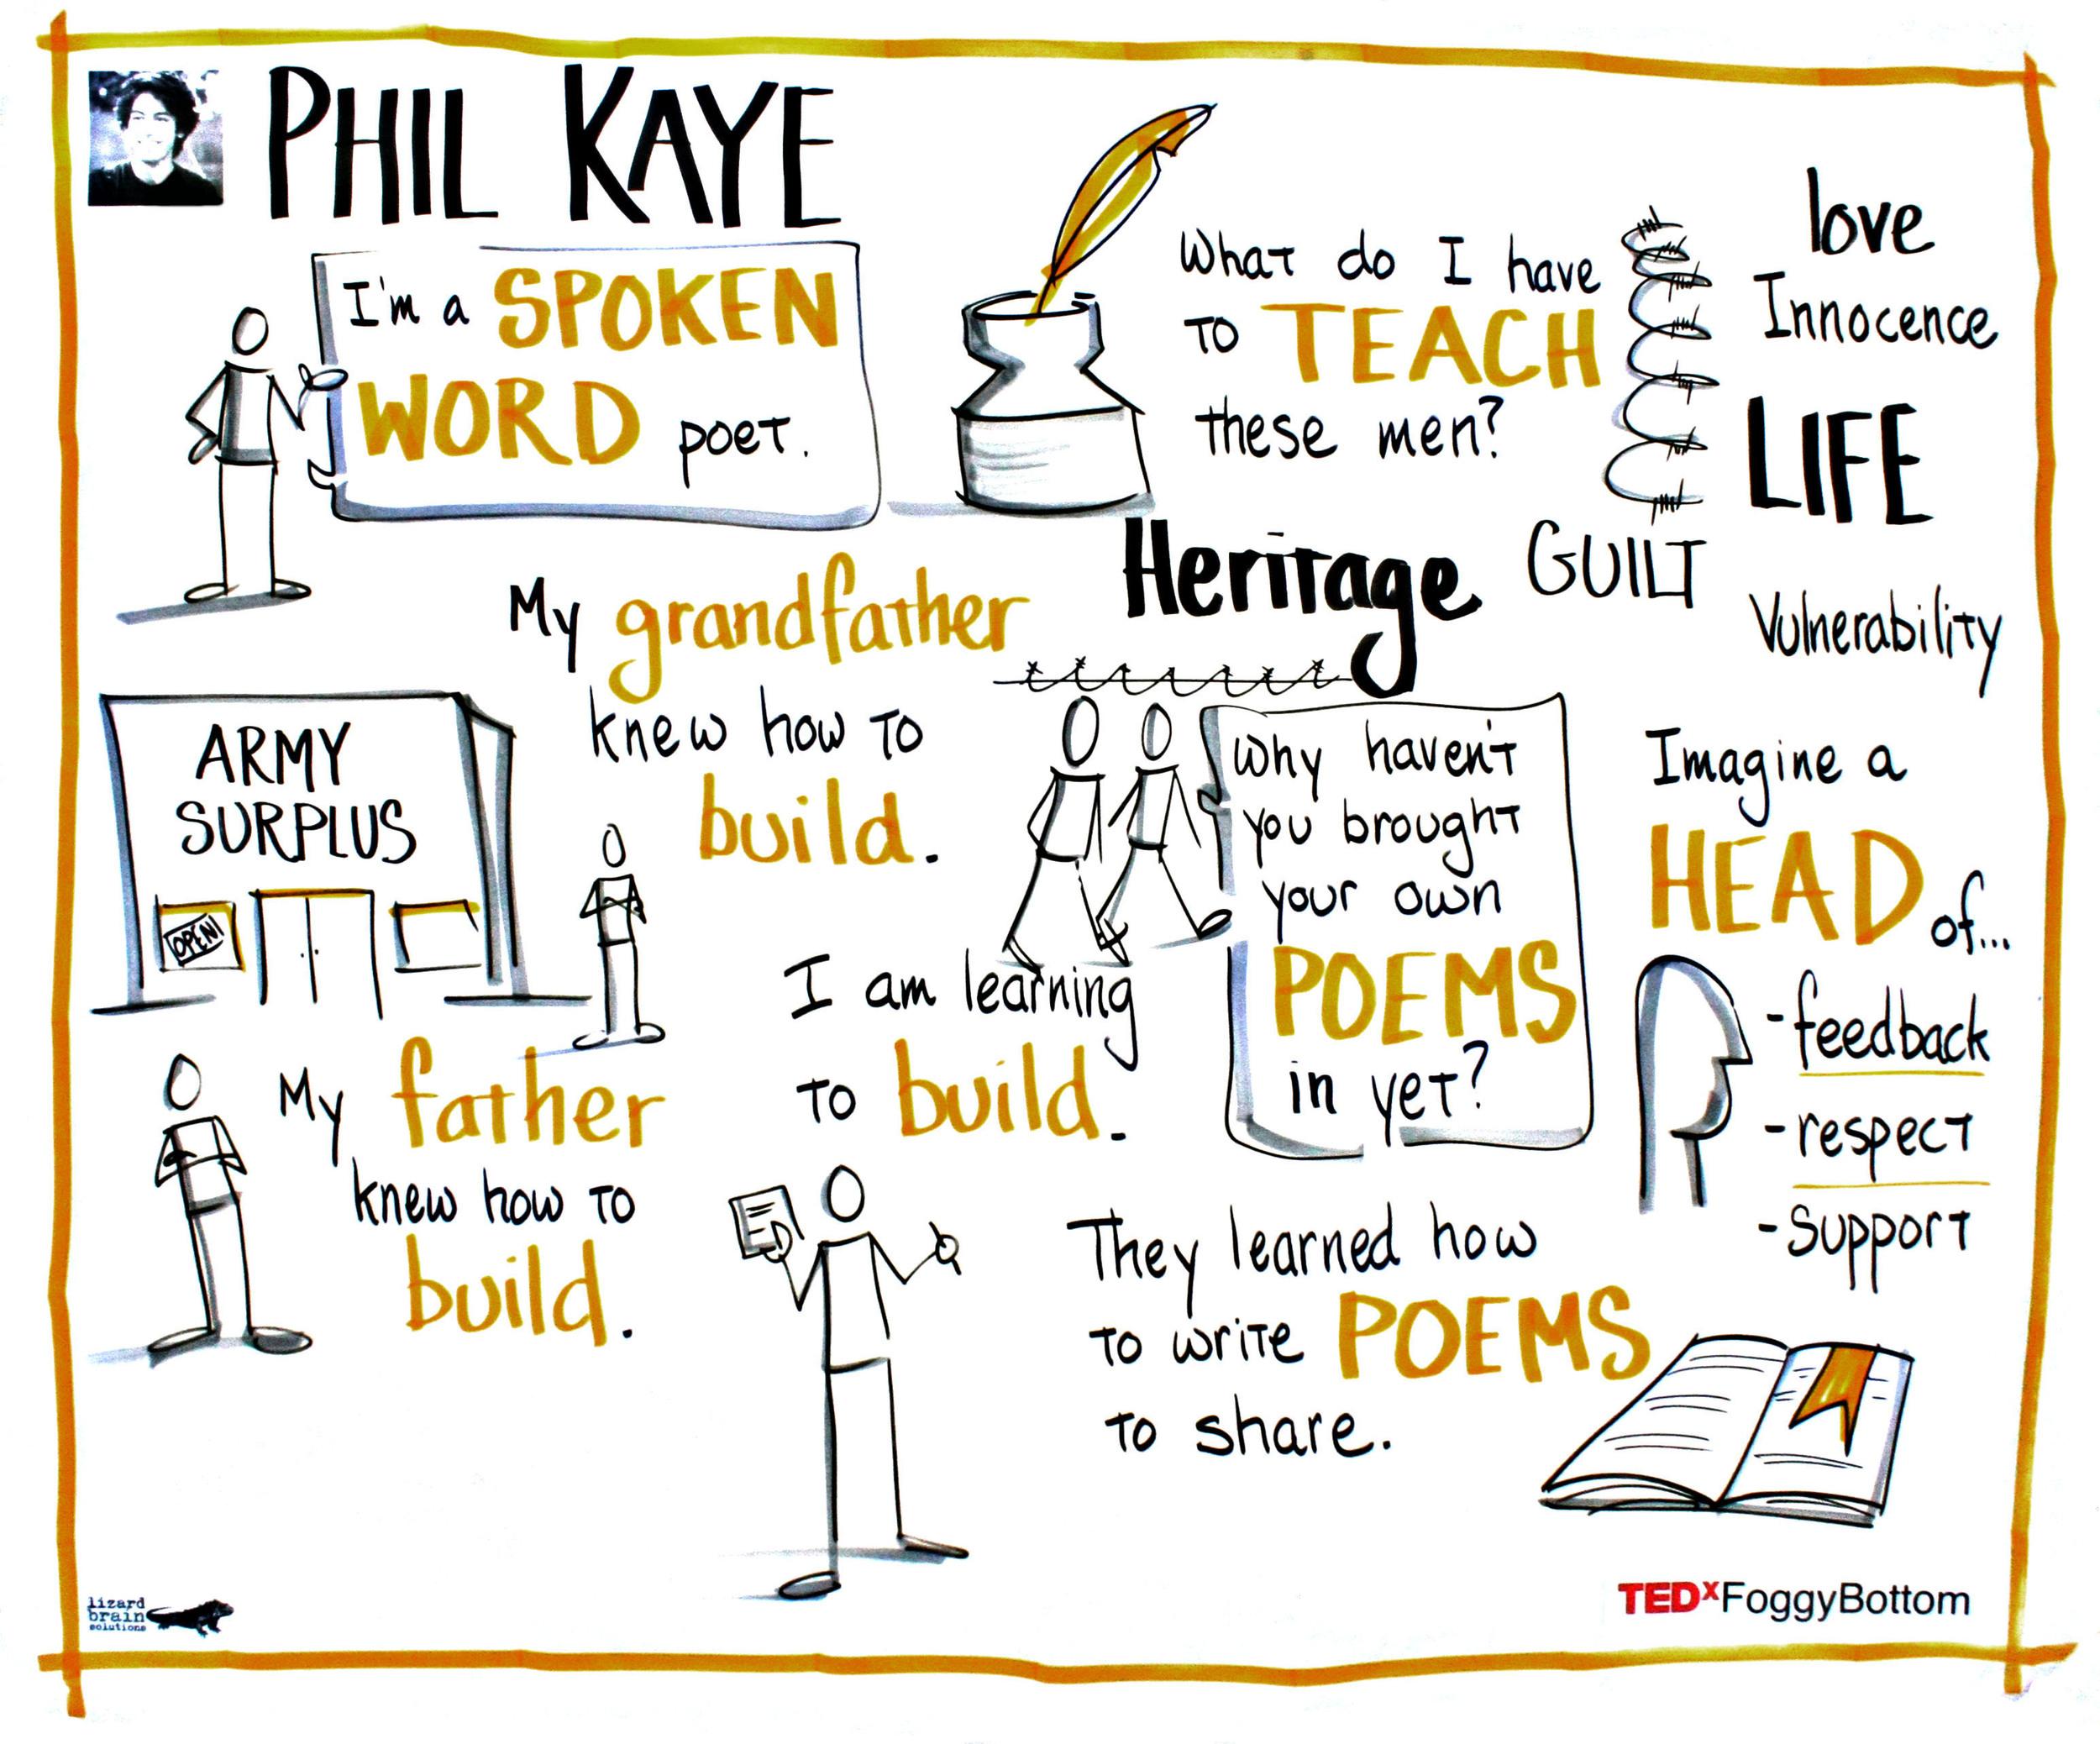 06 Phil Kaye.jpg